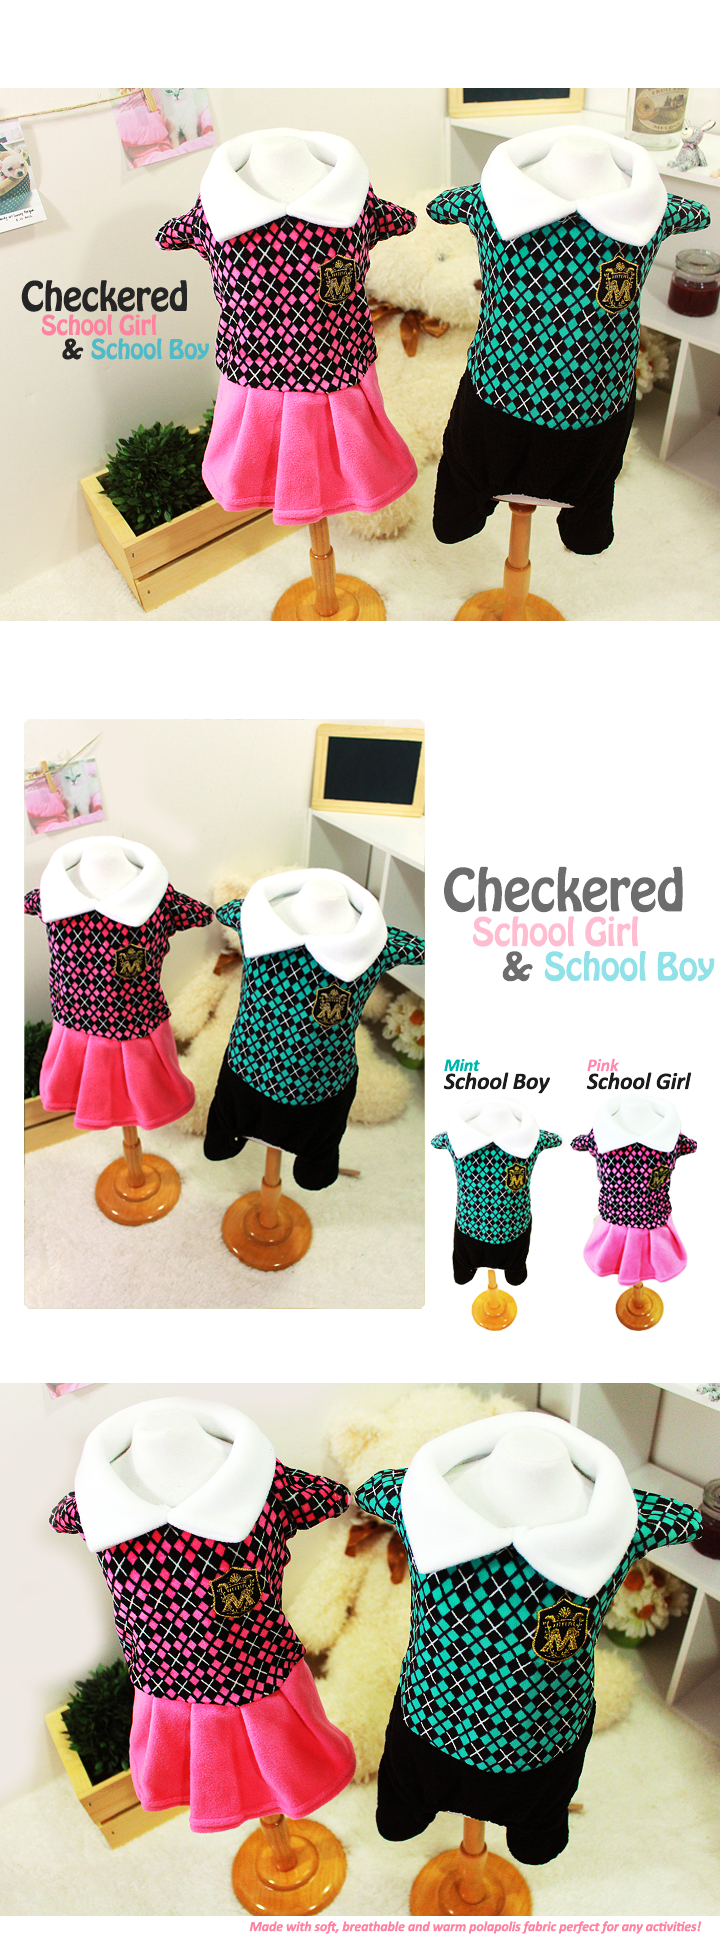 checkered-school-girl-boy-1.png